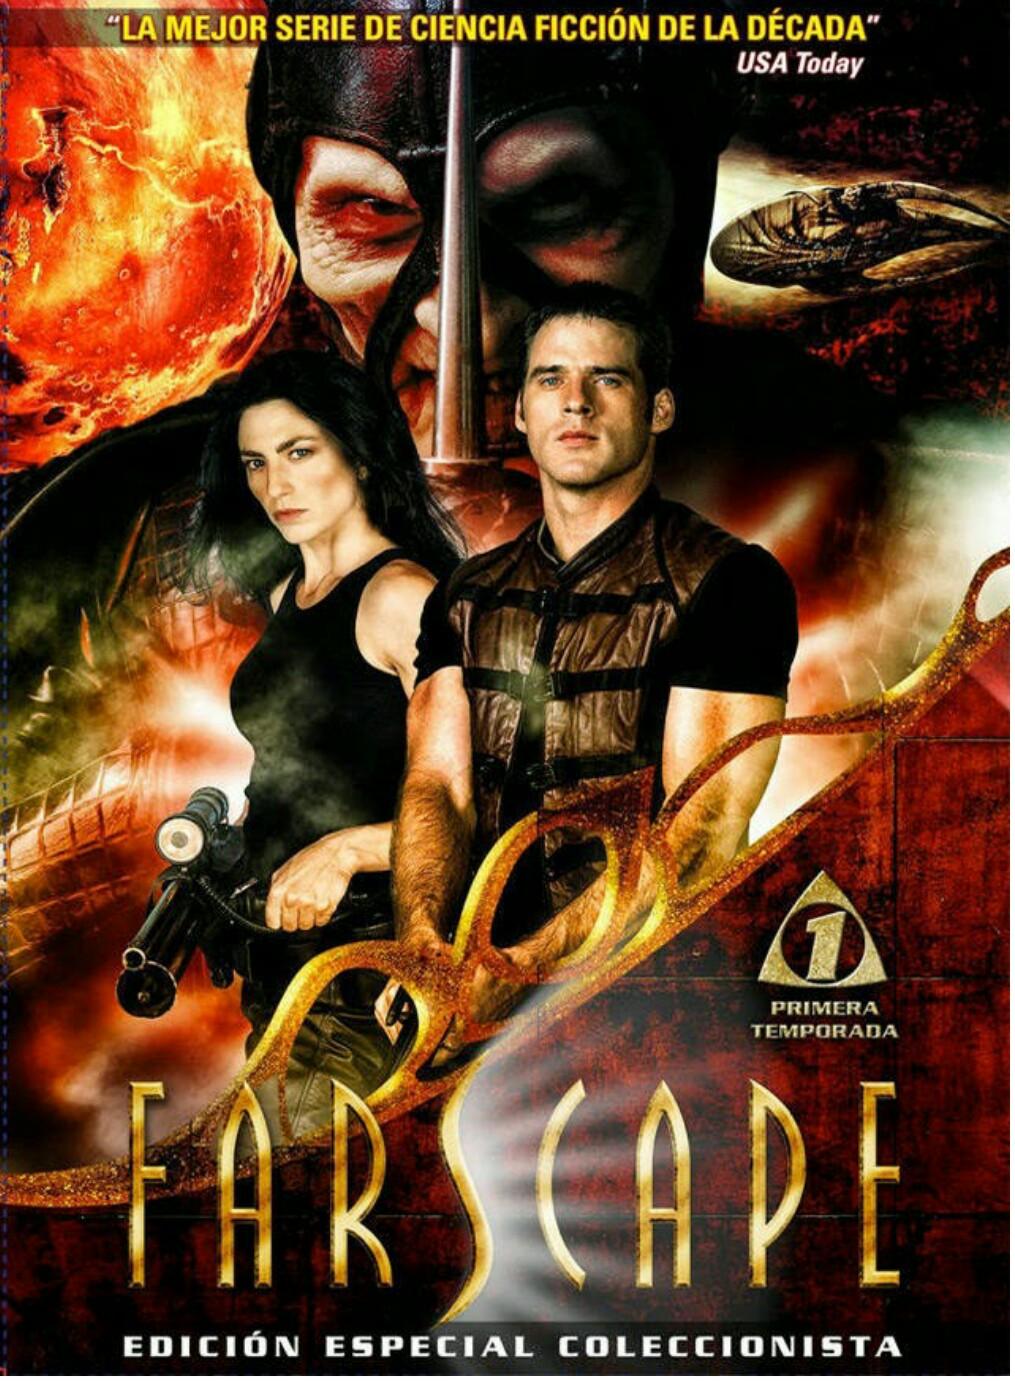 Farscape Temporada 1 WEB DL-720p Dual Latino/Ingles